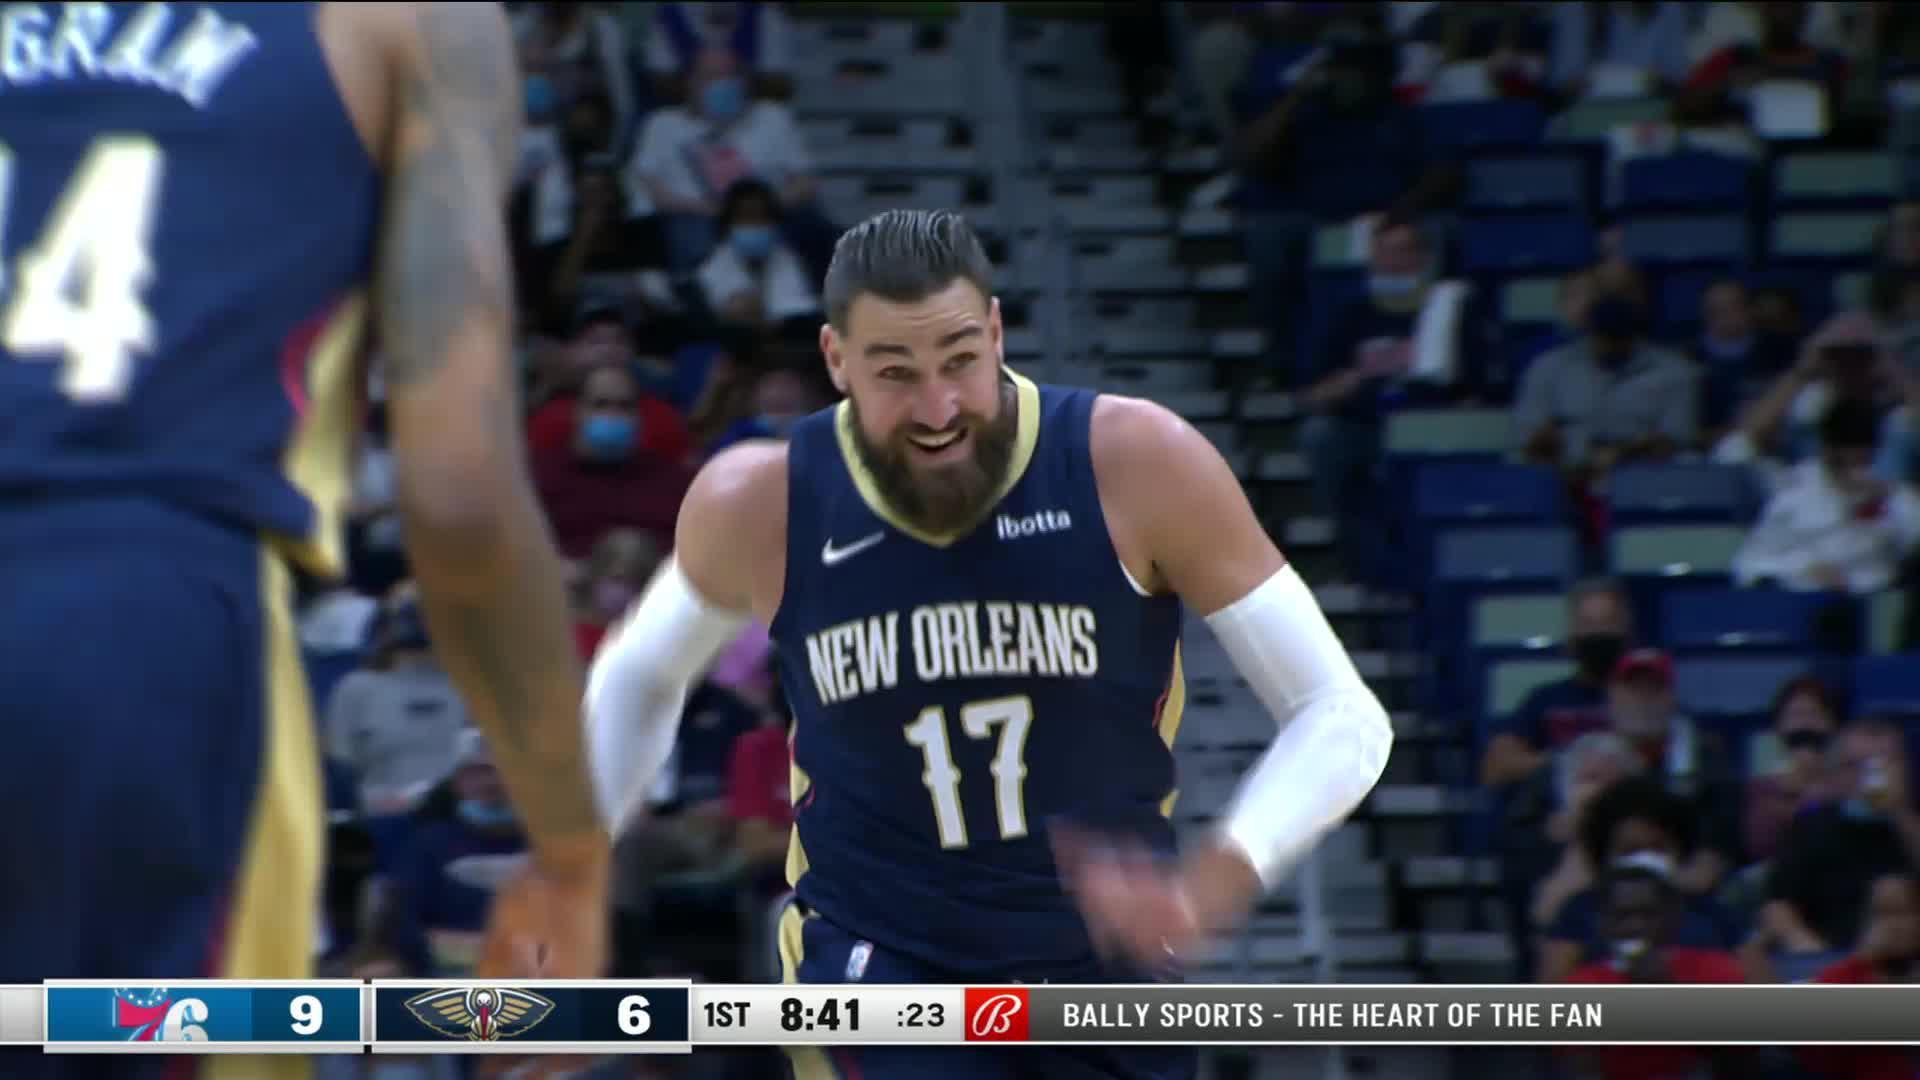 Jonas Valančiūnas STRONG dunk in transition   76ers-Pelicans